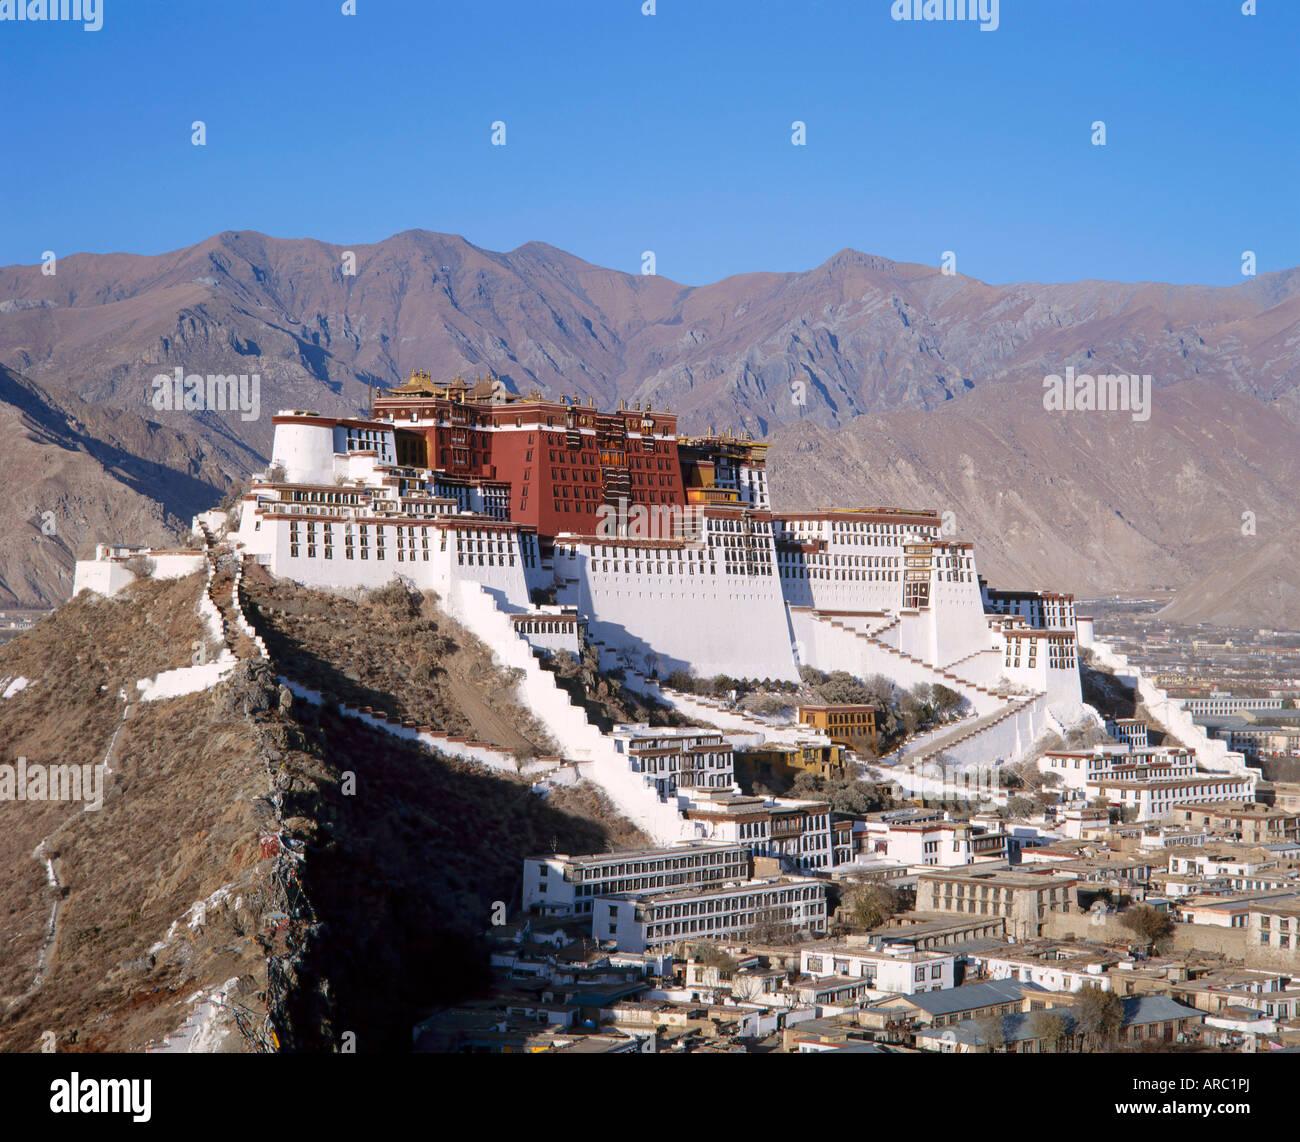 Der Potala-Palast, die ehemalige Residenz des Dalai Lama in Lhasa, Tibet, Asien Stockbild